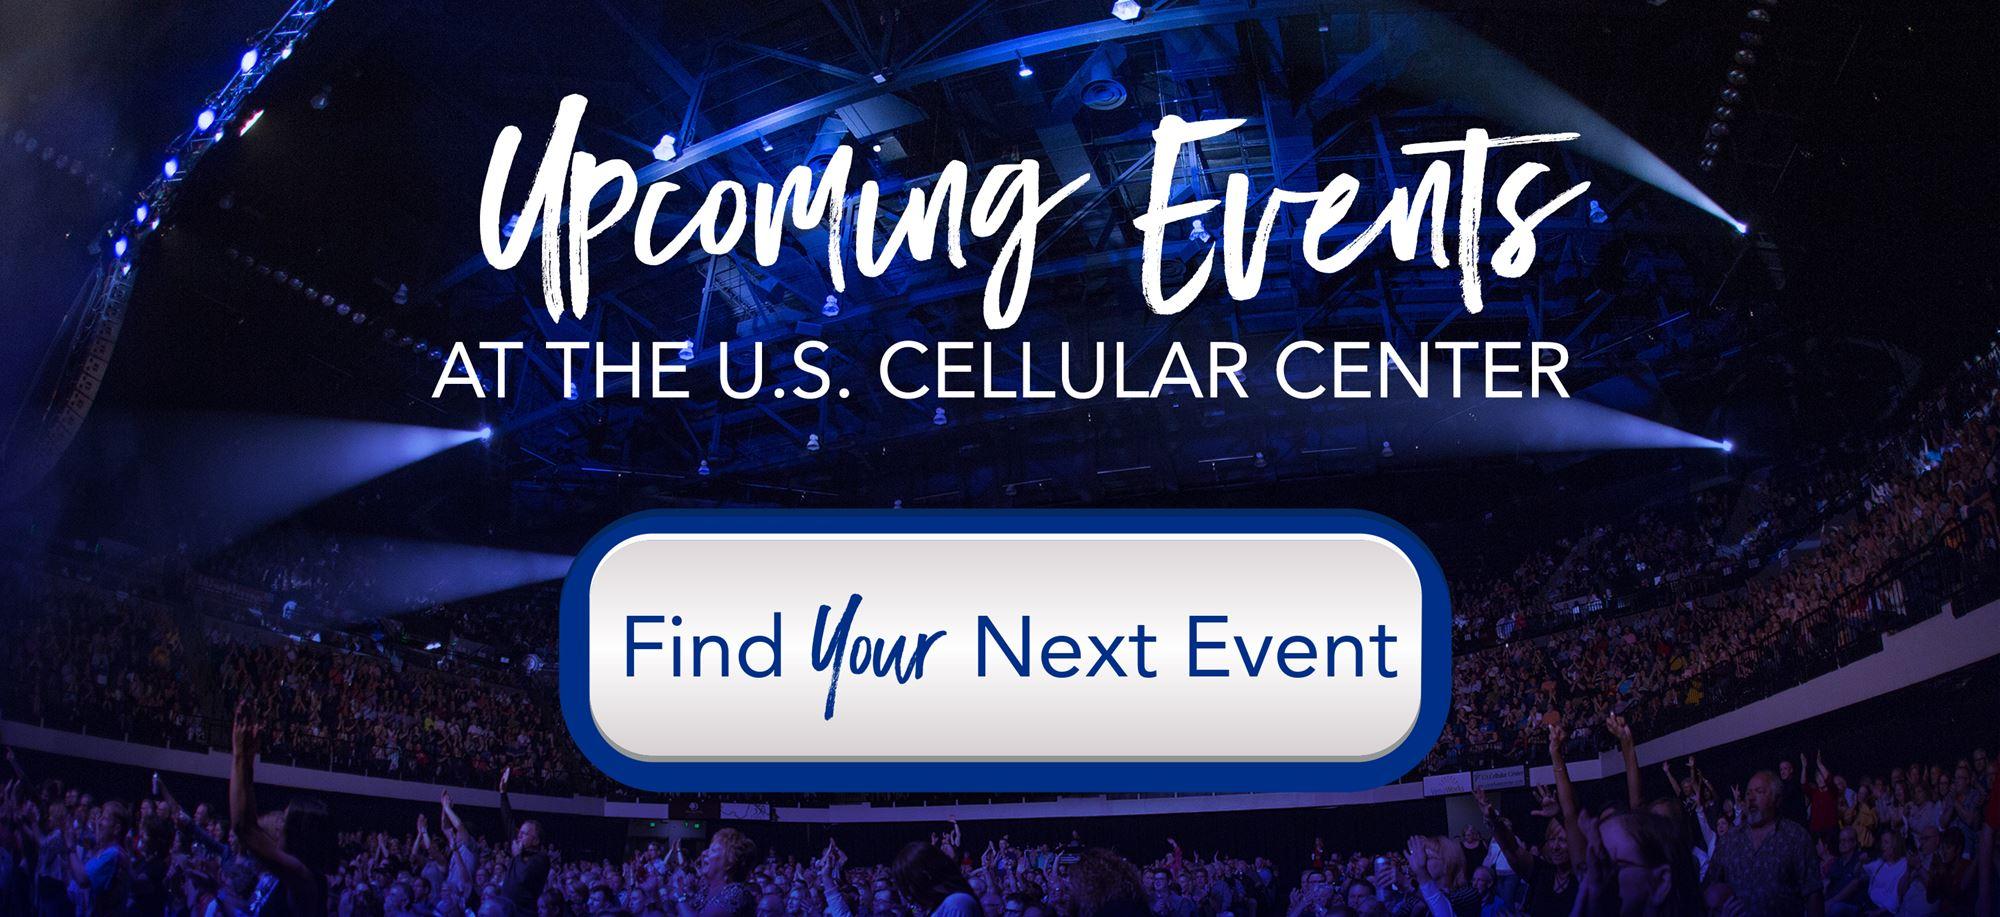 Events at the U.S. Cellular Center in Cedar Rapids, Iowa